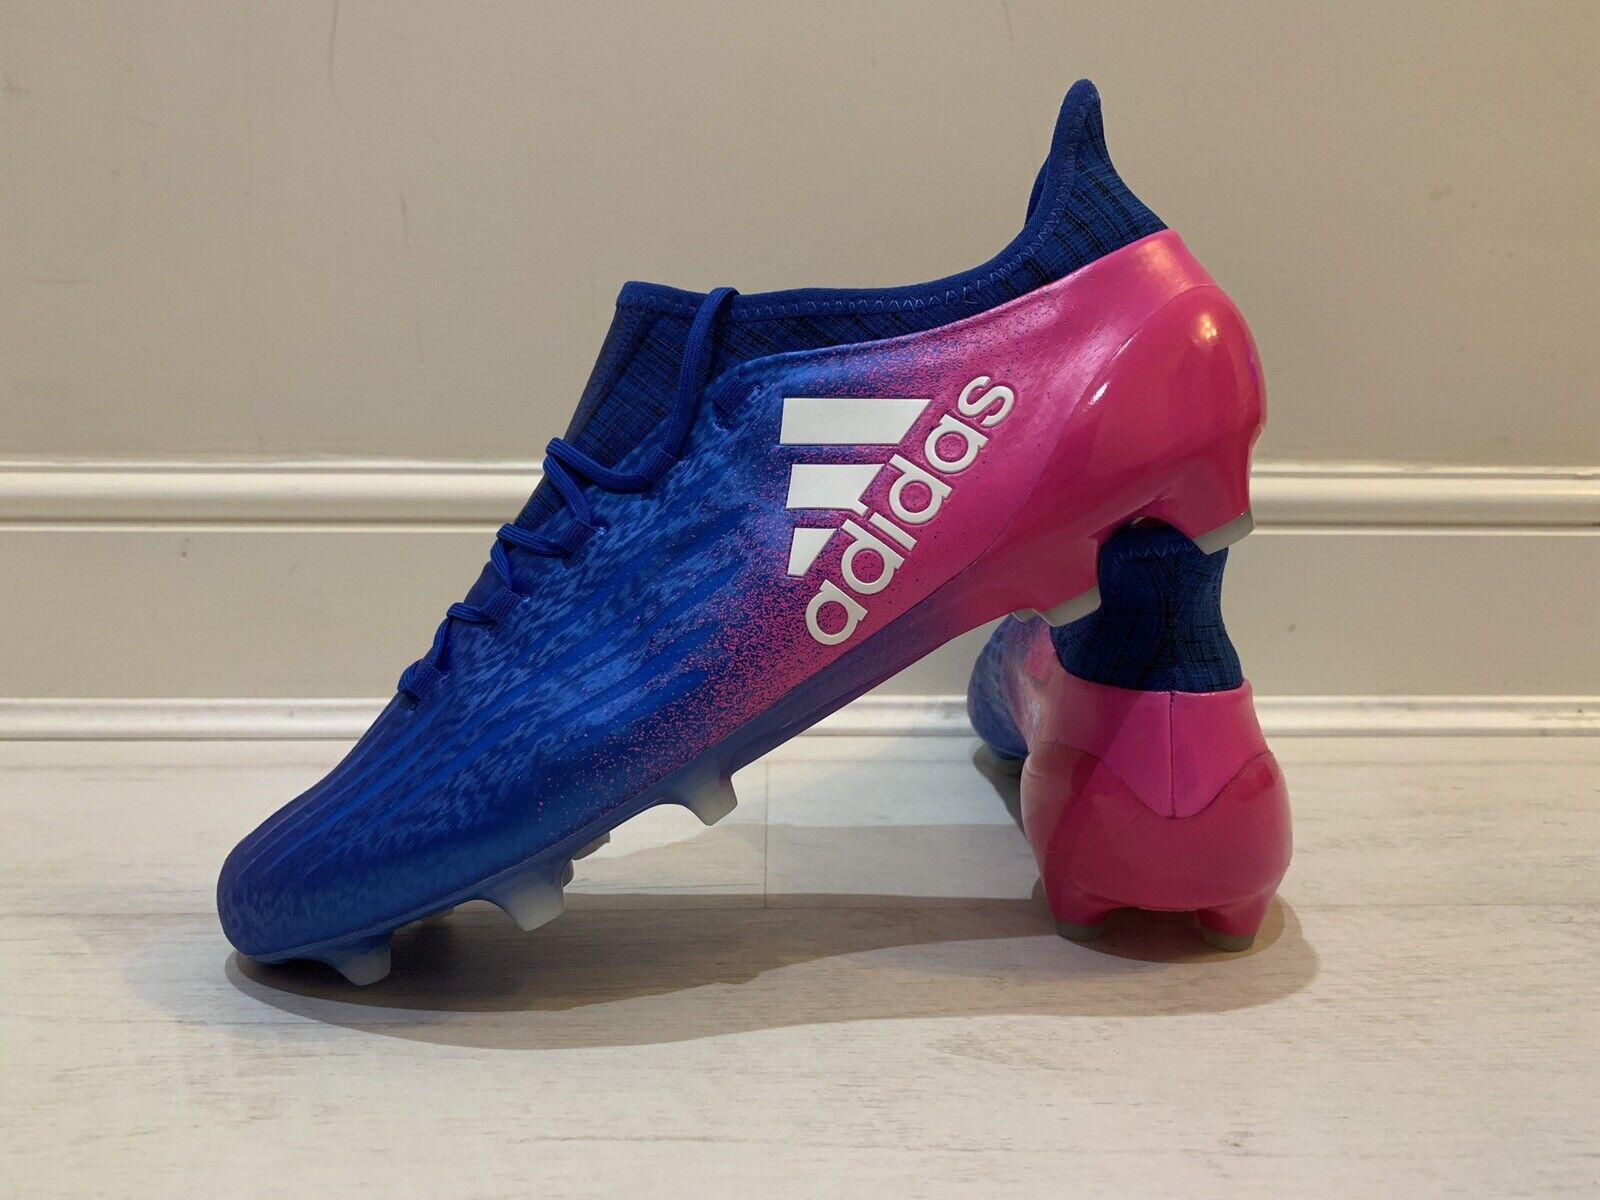 Zlatan Ibrahimovic Adidas X Football Boots NOT Match Worn Player Issue Man UTD